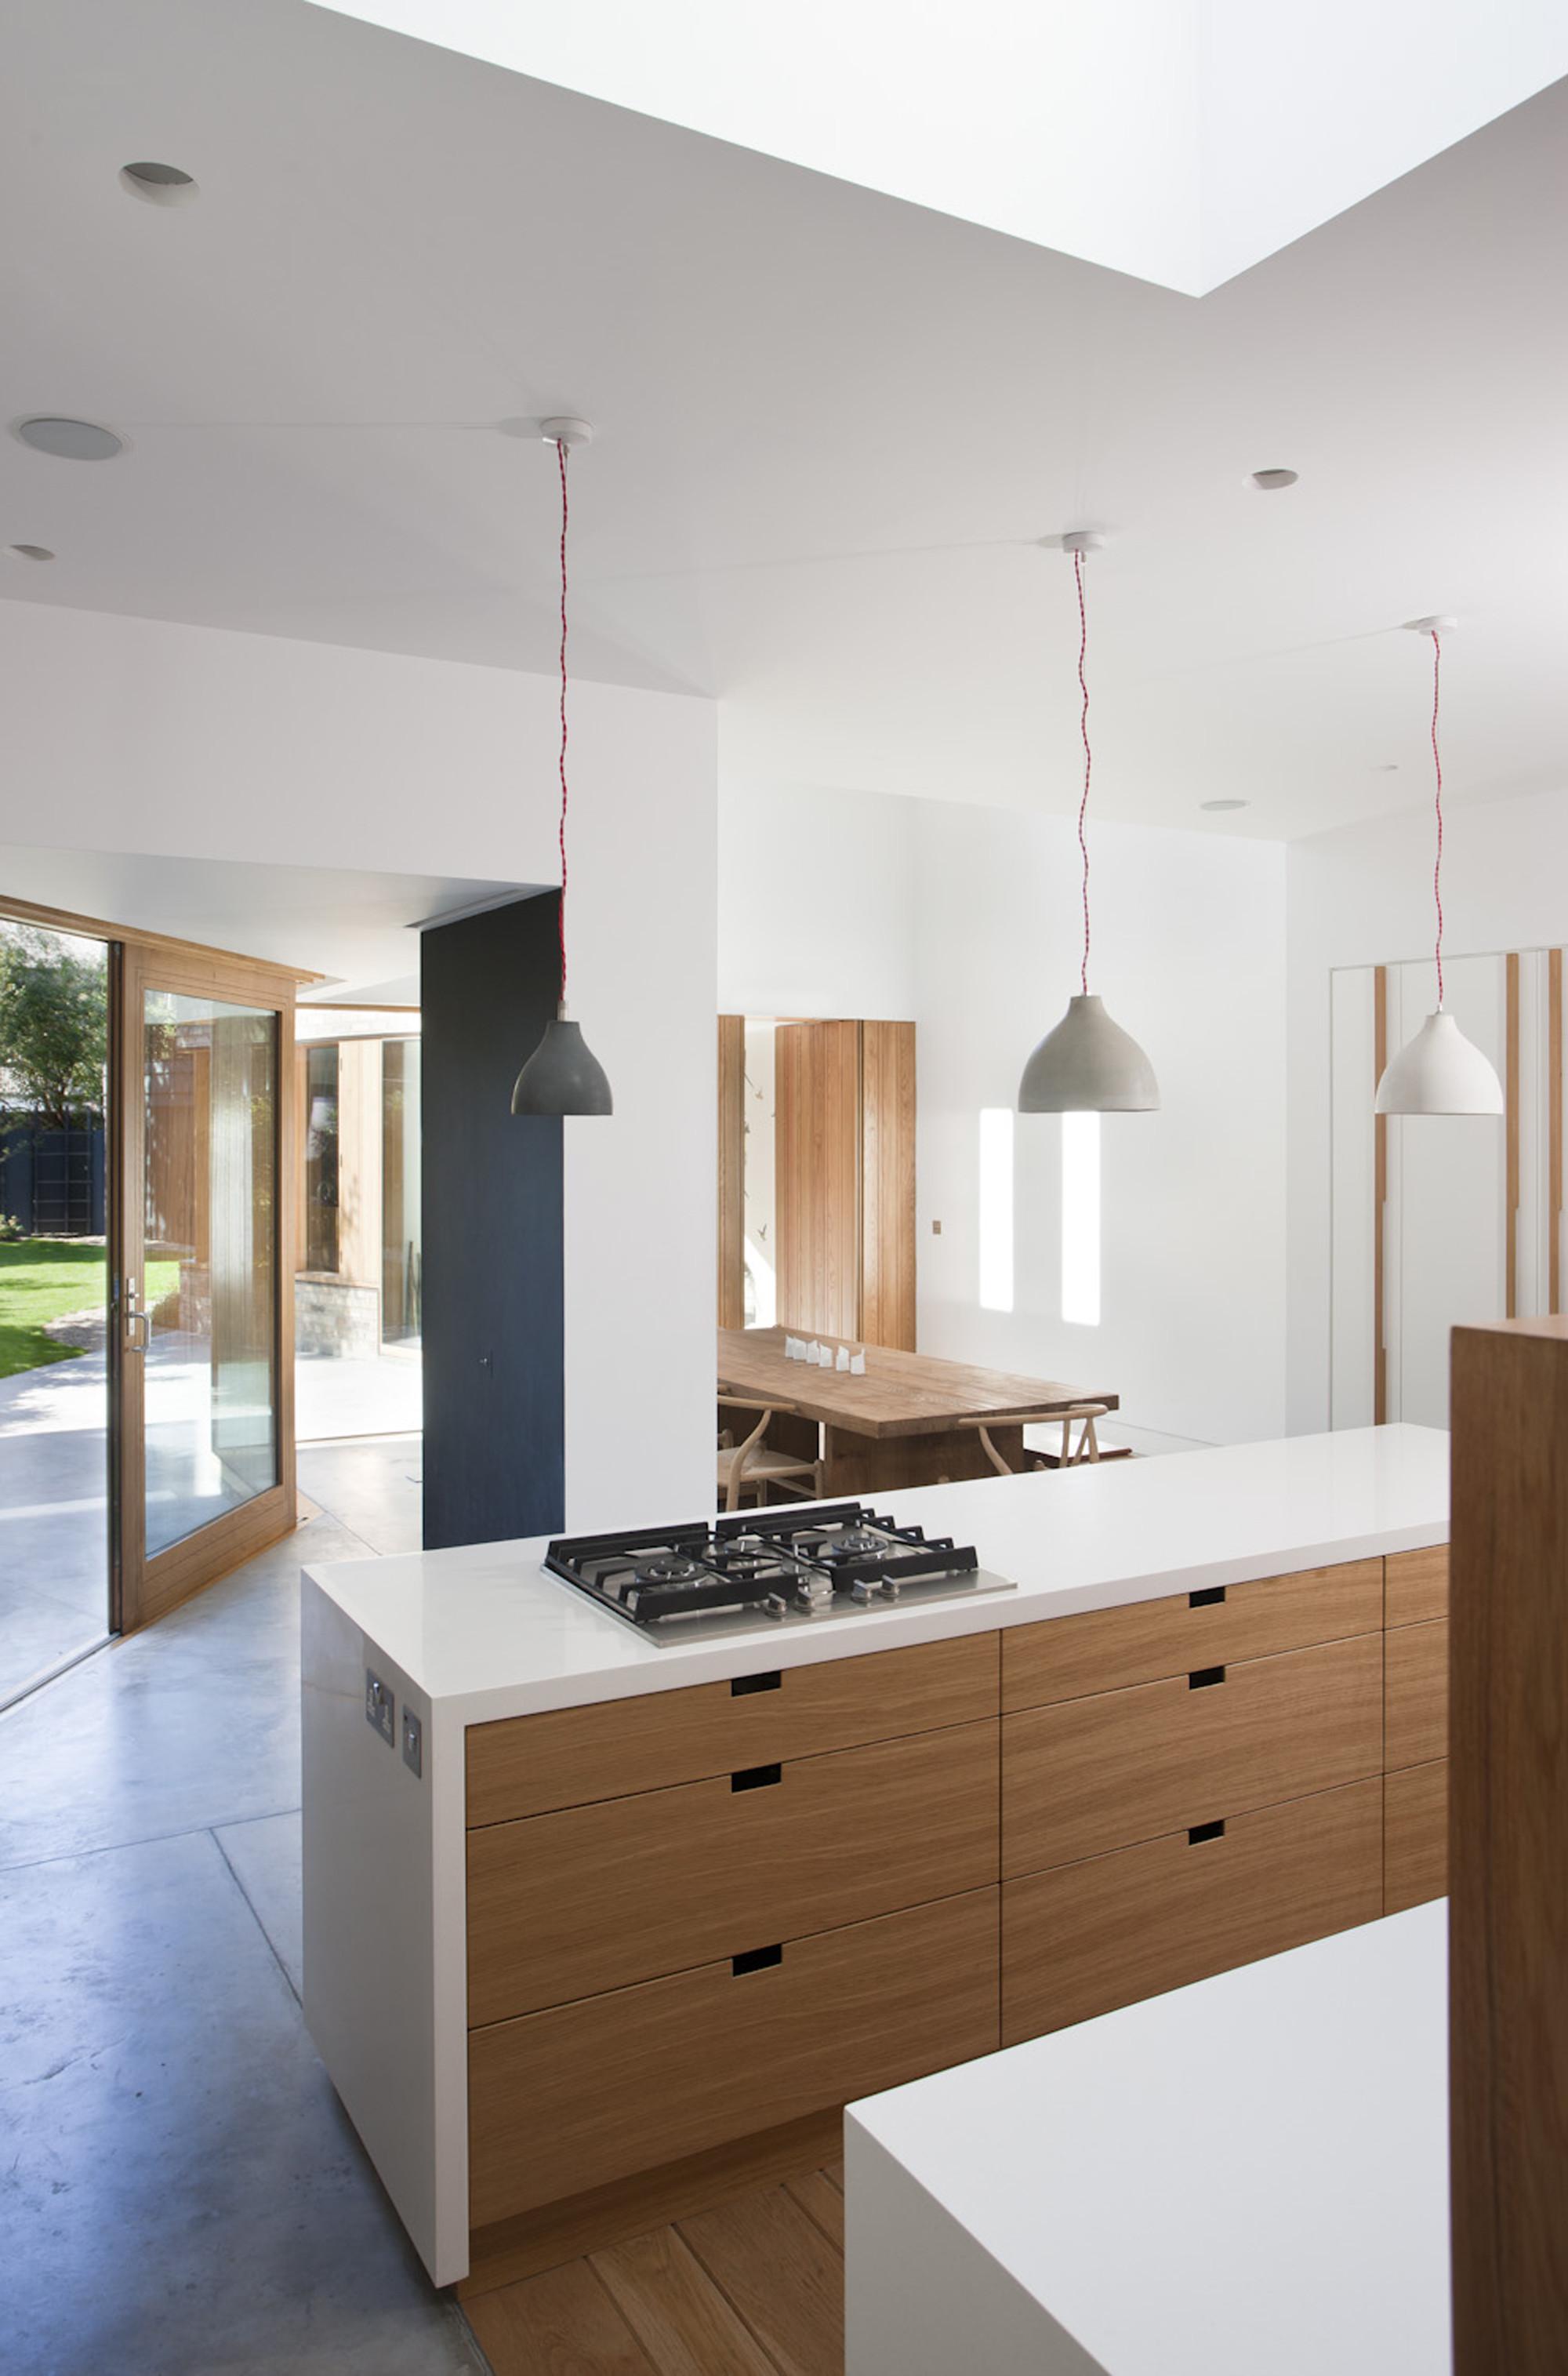 Ballsbridge / Peter Legge Associates